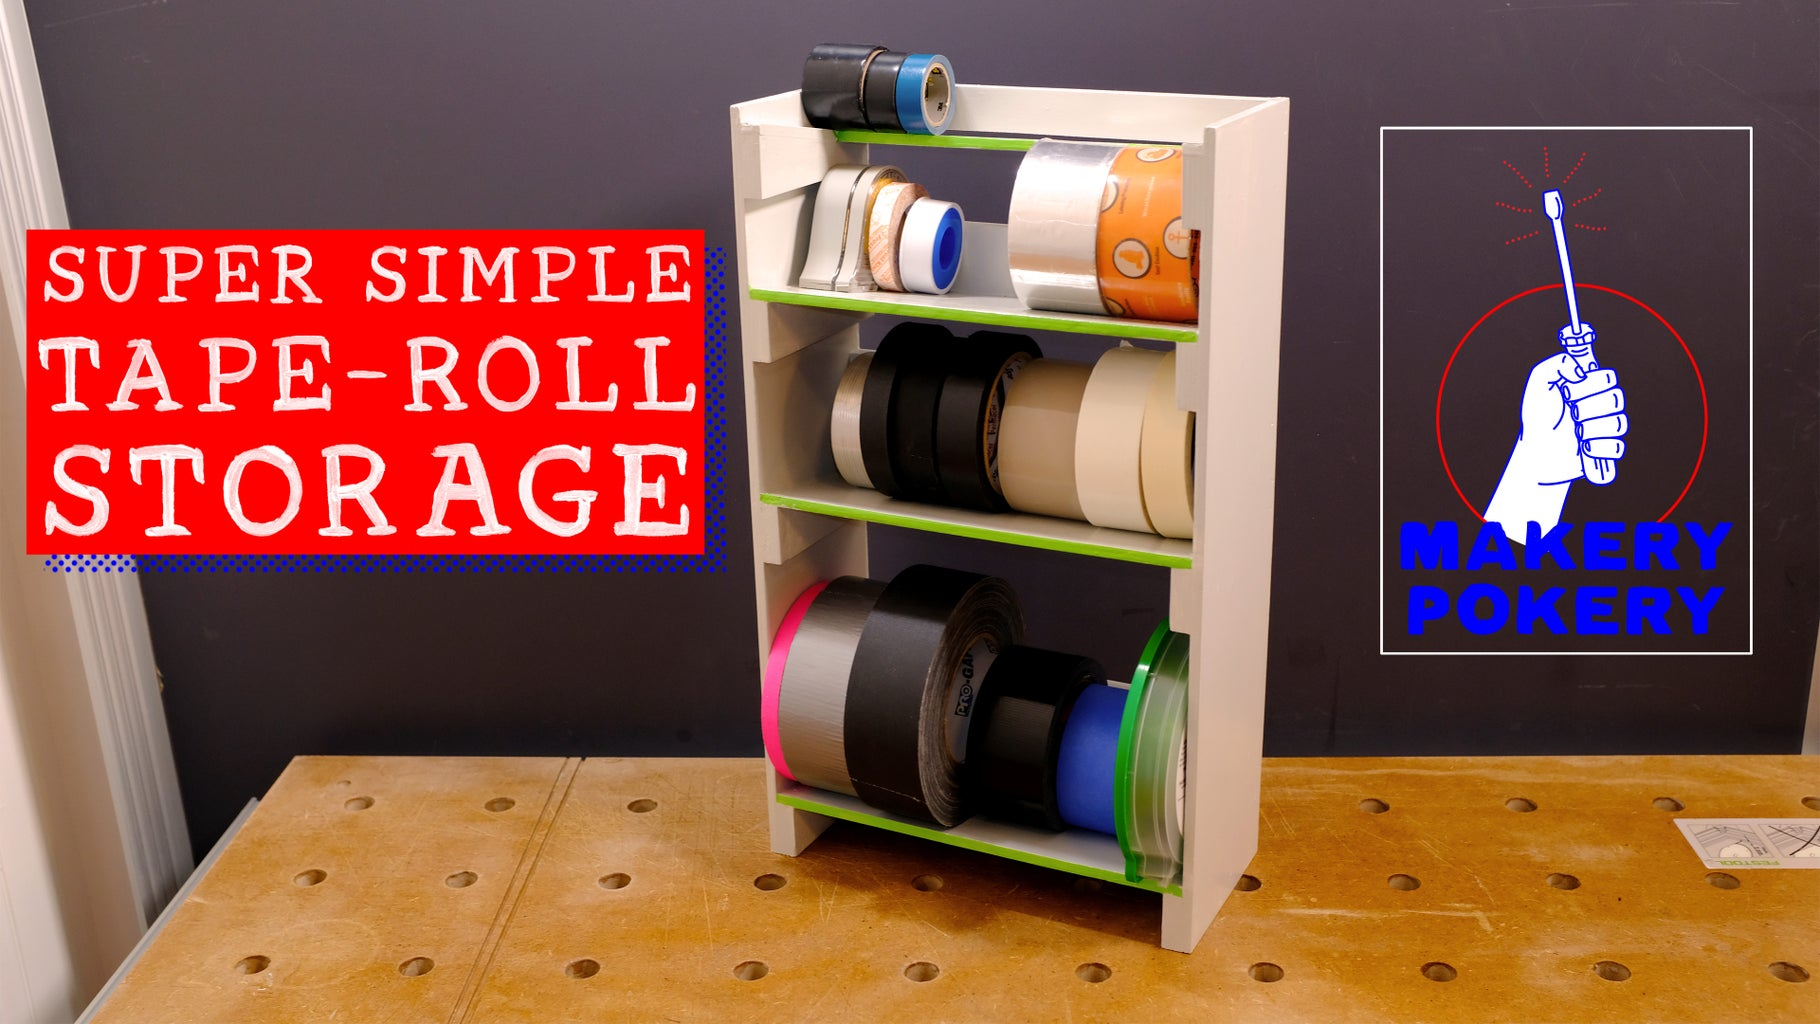 Super Simple Tape-Roll Storage Rack